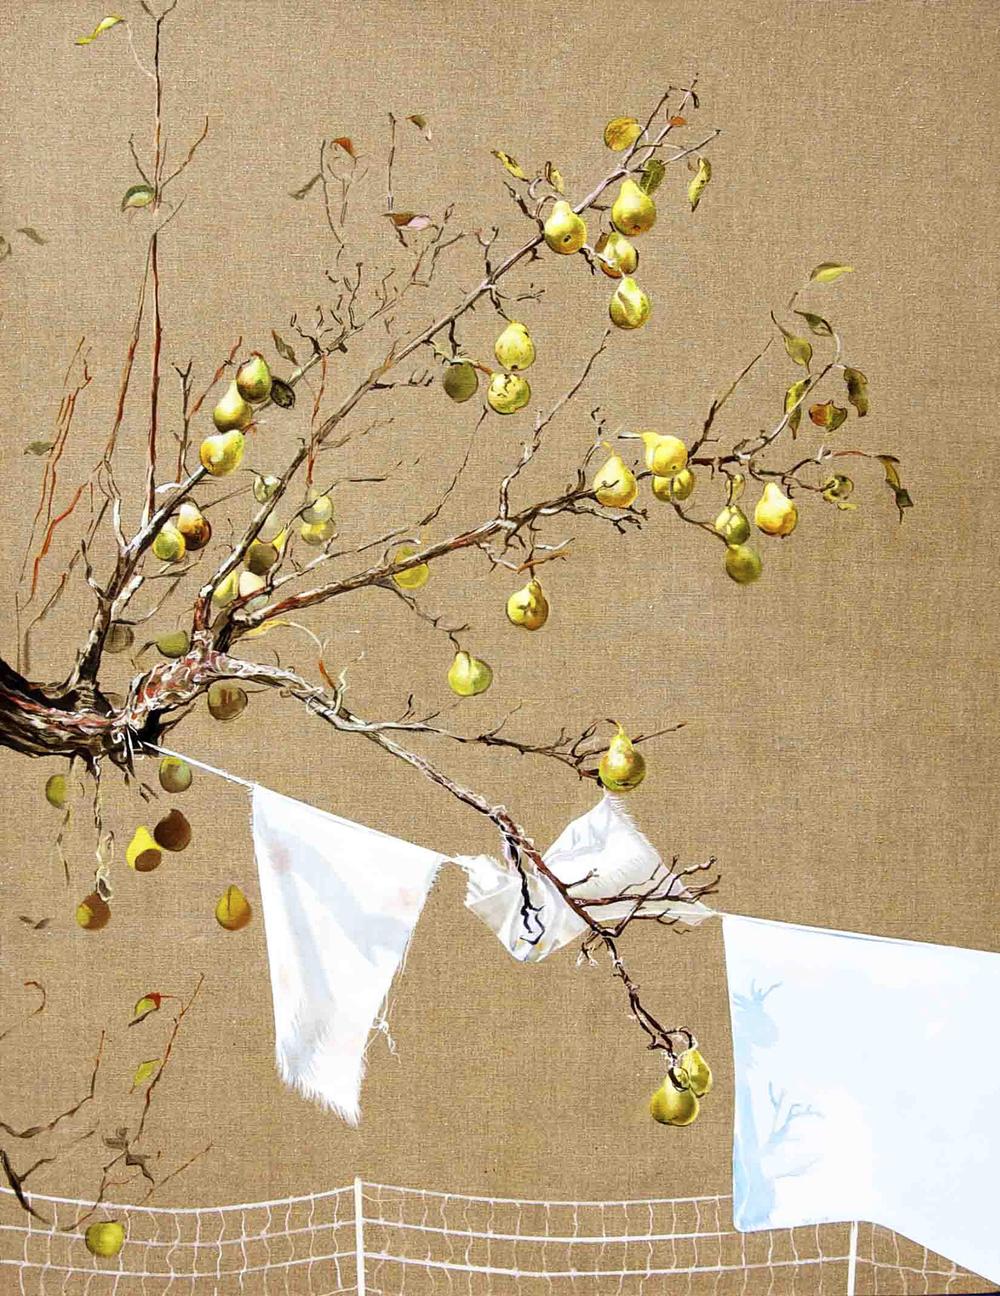 Pear Tree oil on linen 54x42, 2011